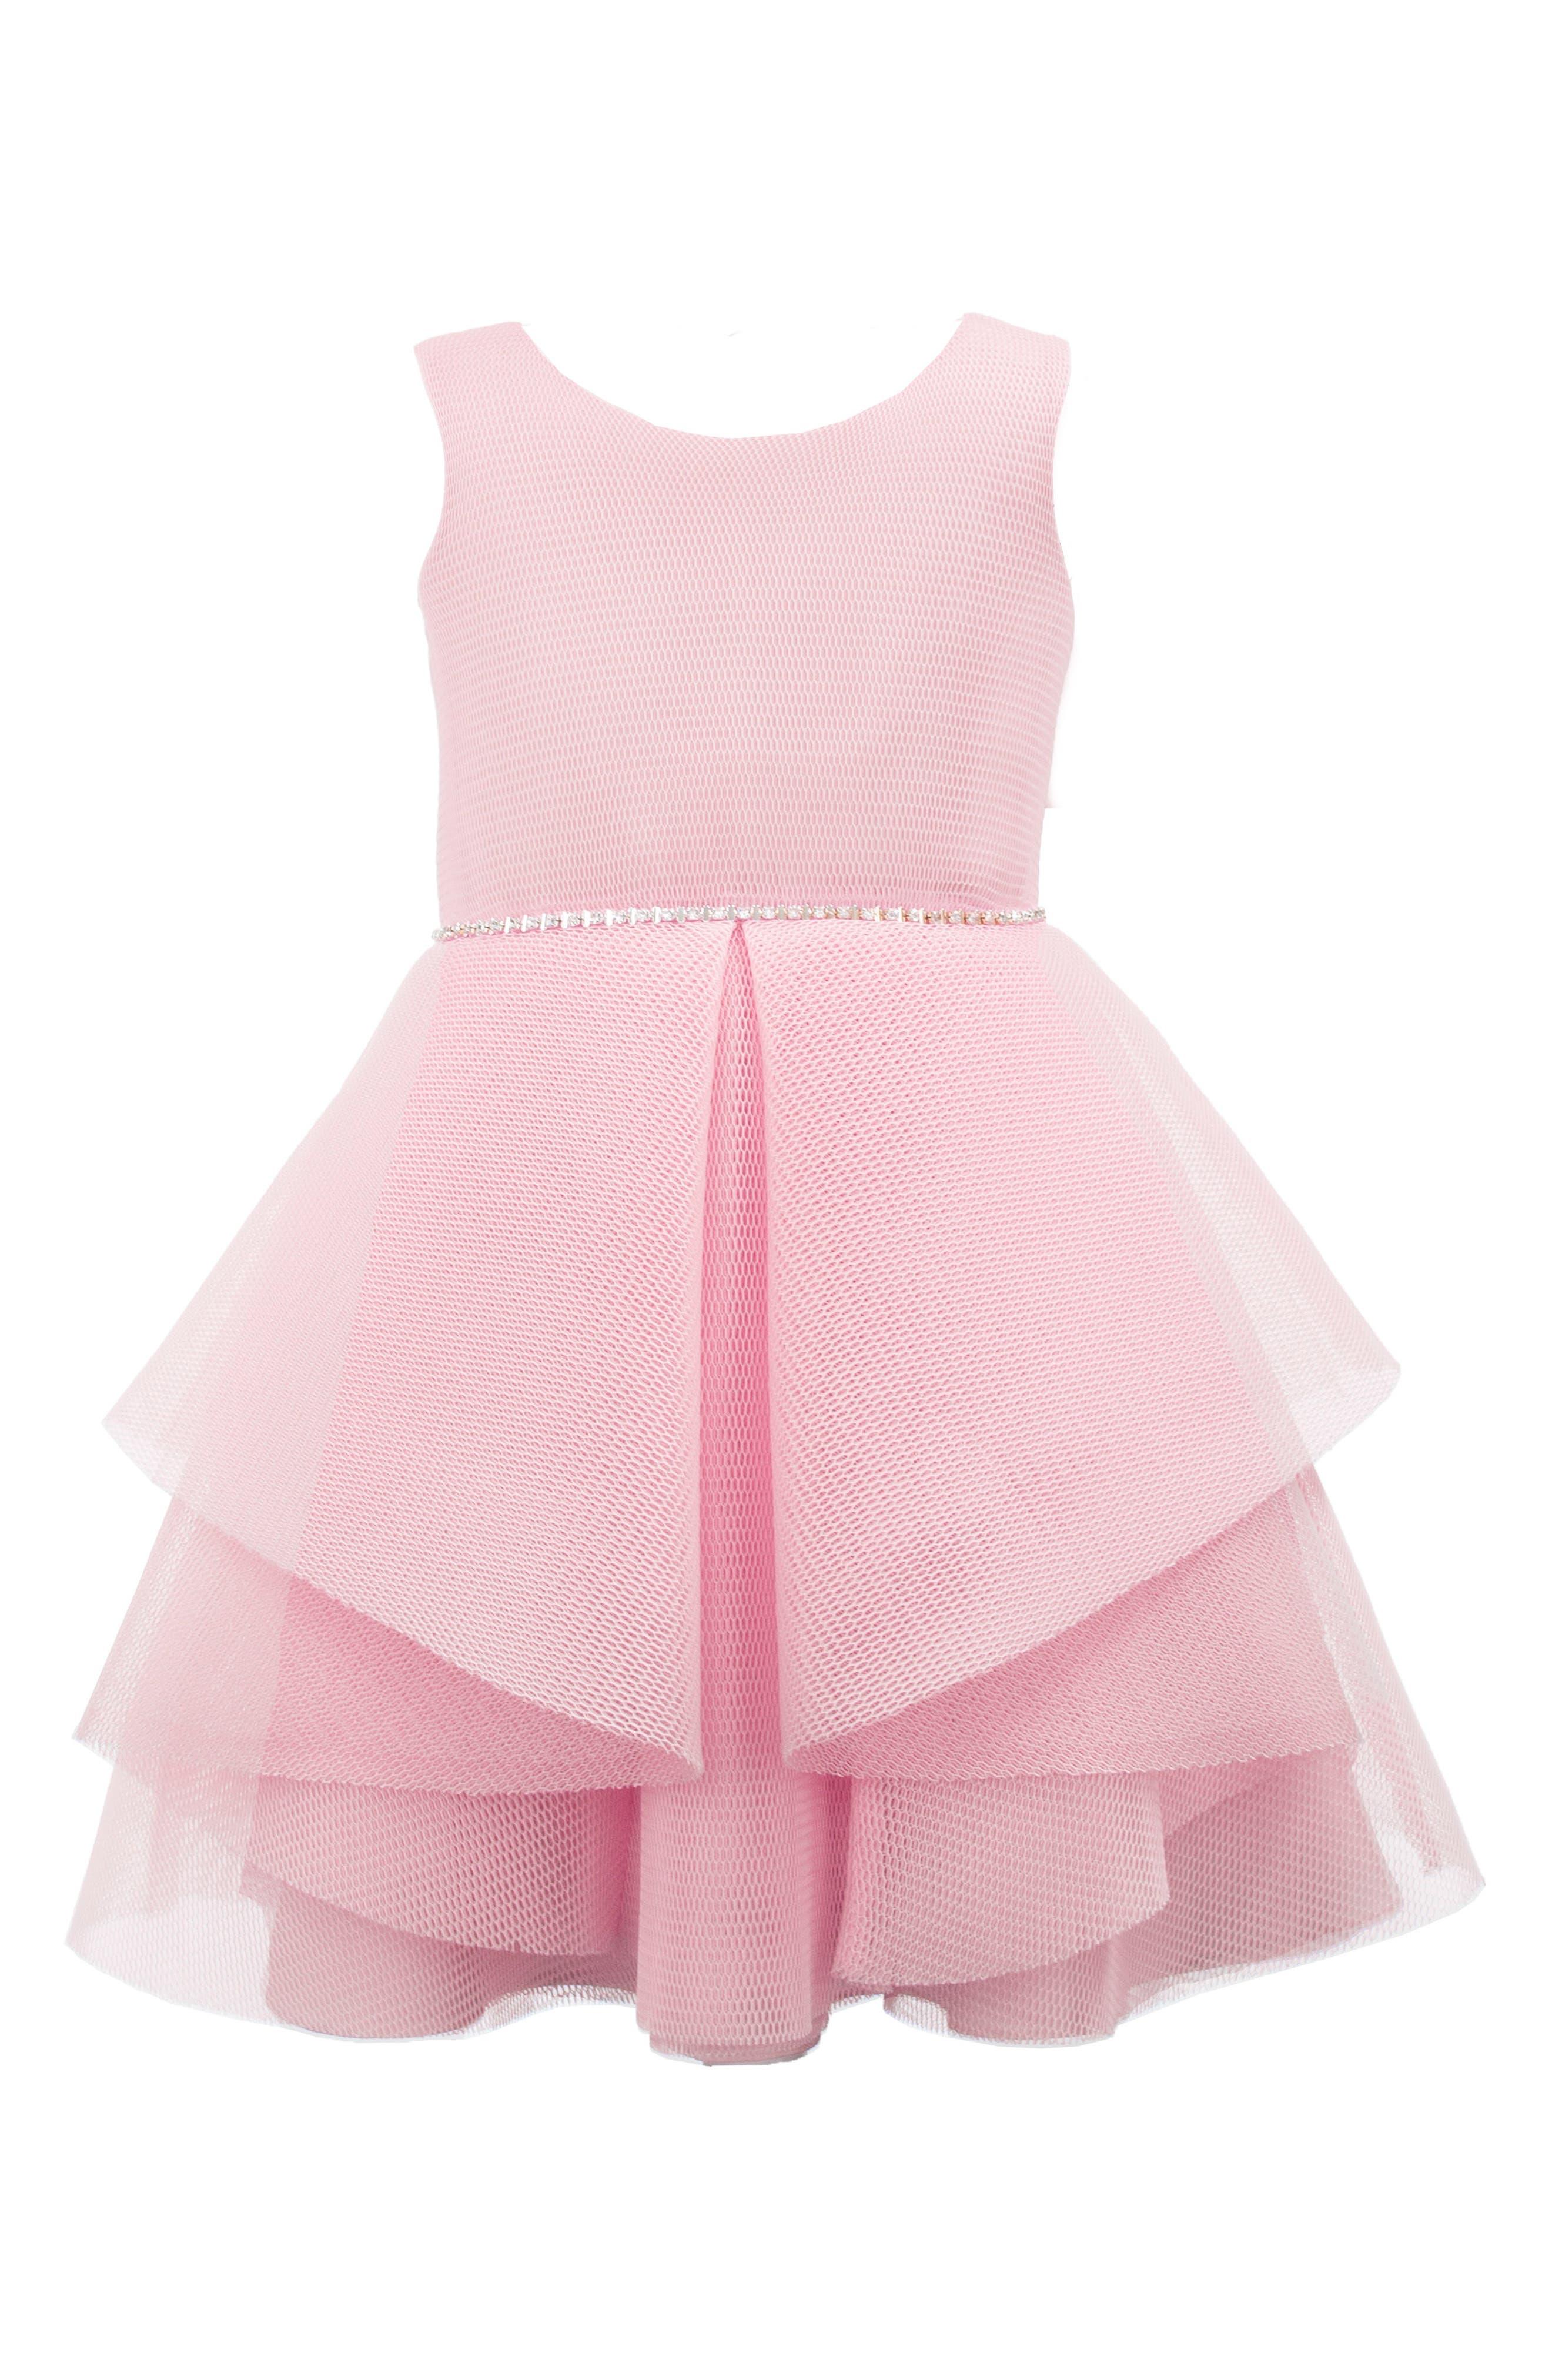 Wrapover Mesh Dress,                         Main,                         color, 660